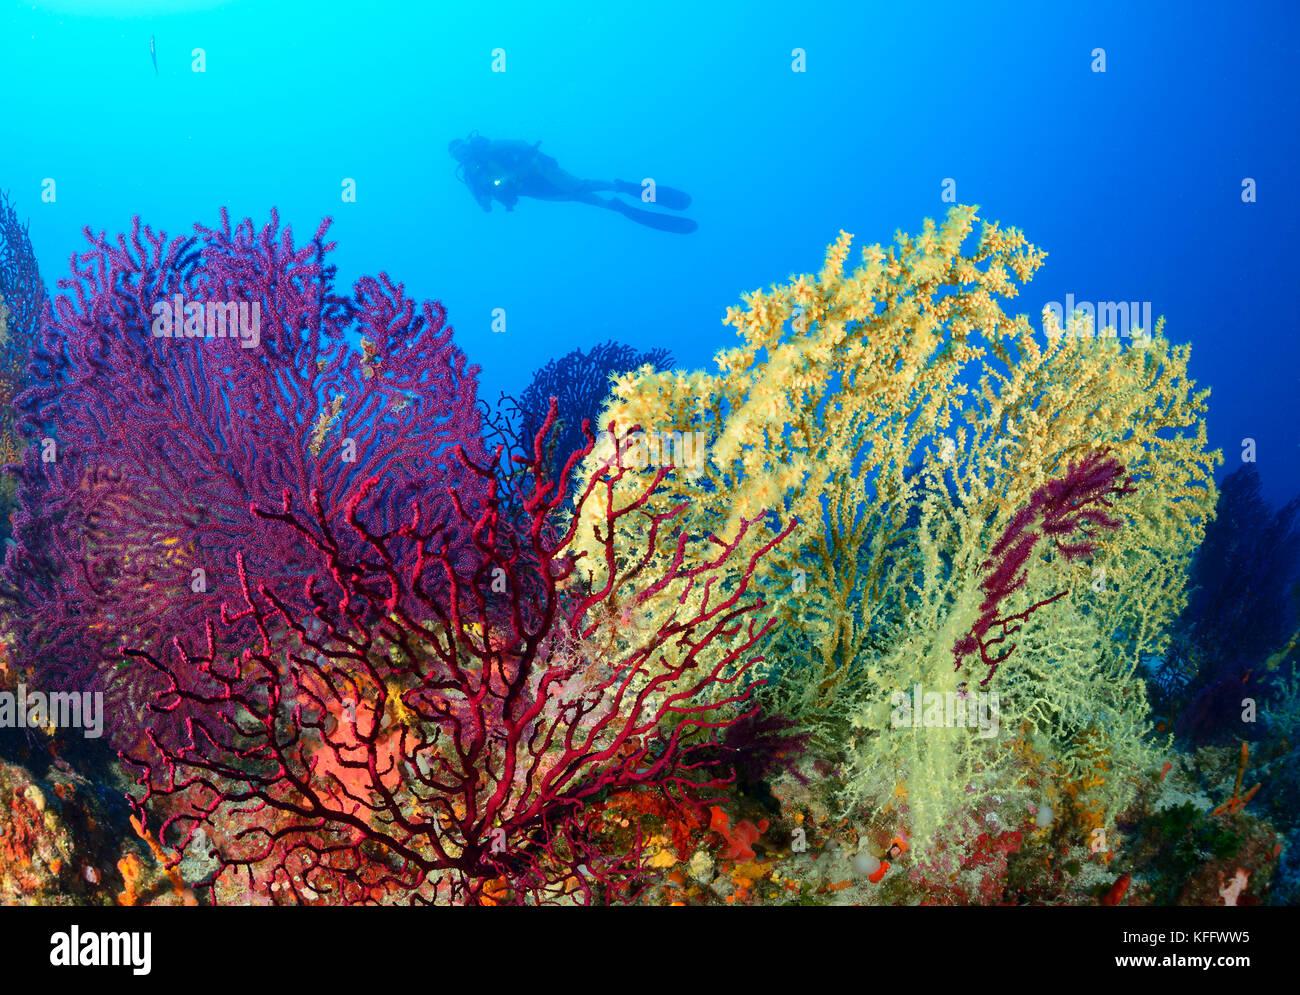 Gold coral and Violescent sea whip, Savalia savaglia and Paramuricea clavata and scuba diver, Adriatic Sea, Mediterranean Stock Photo